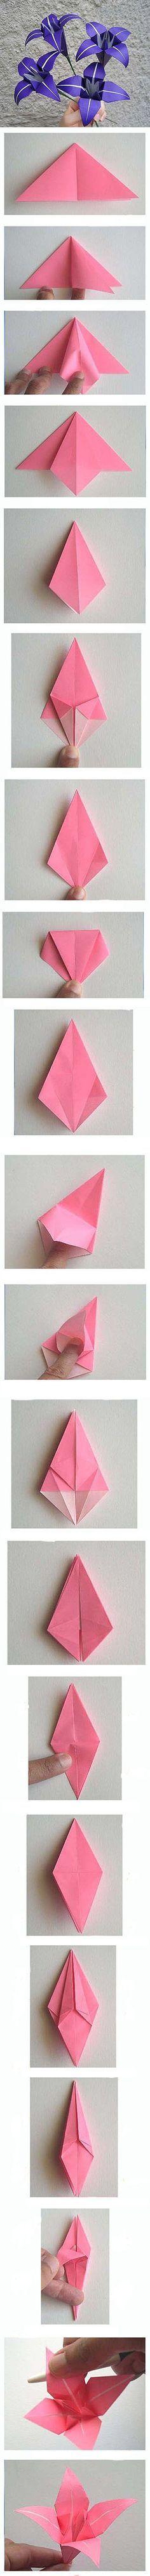 Beautiful Paper Flower DIY u0026 Crafts